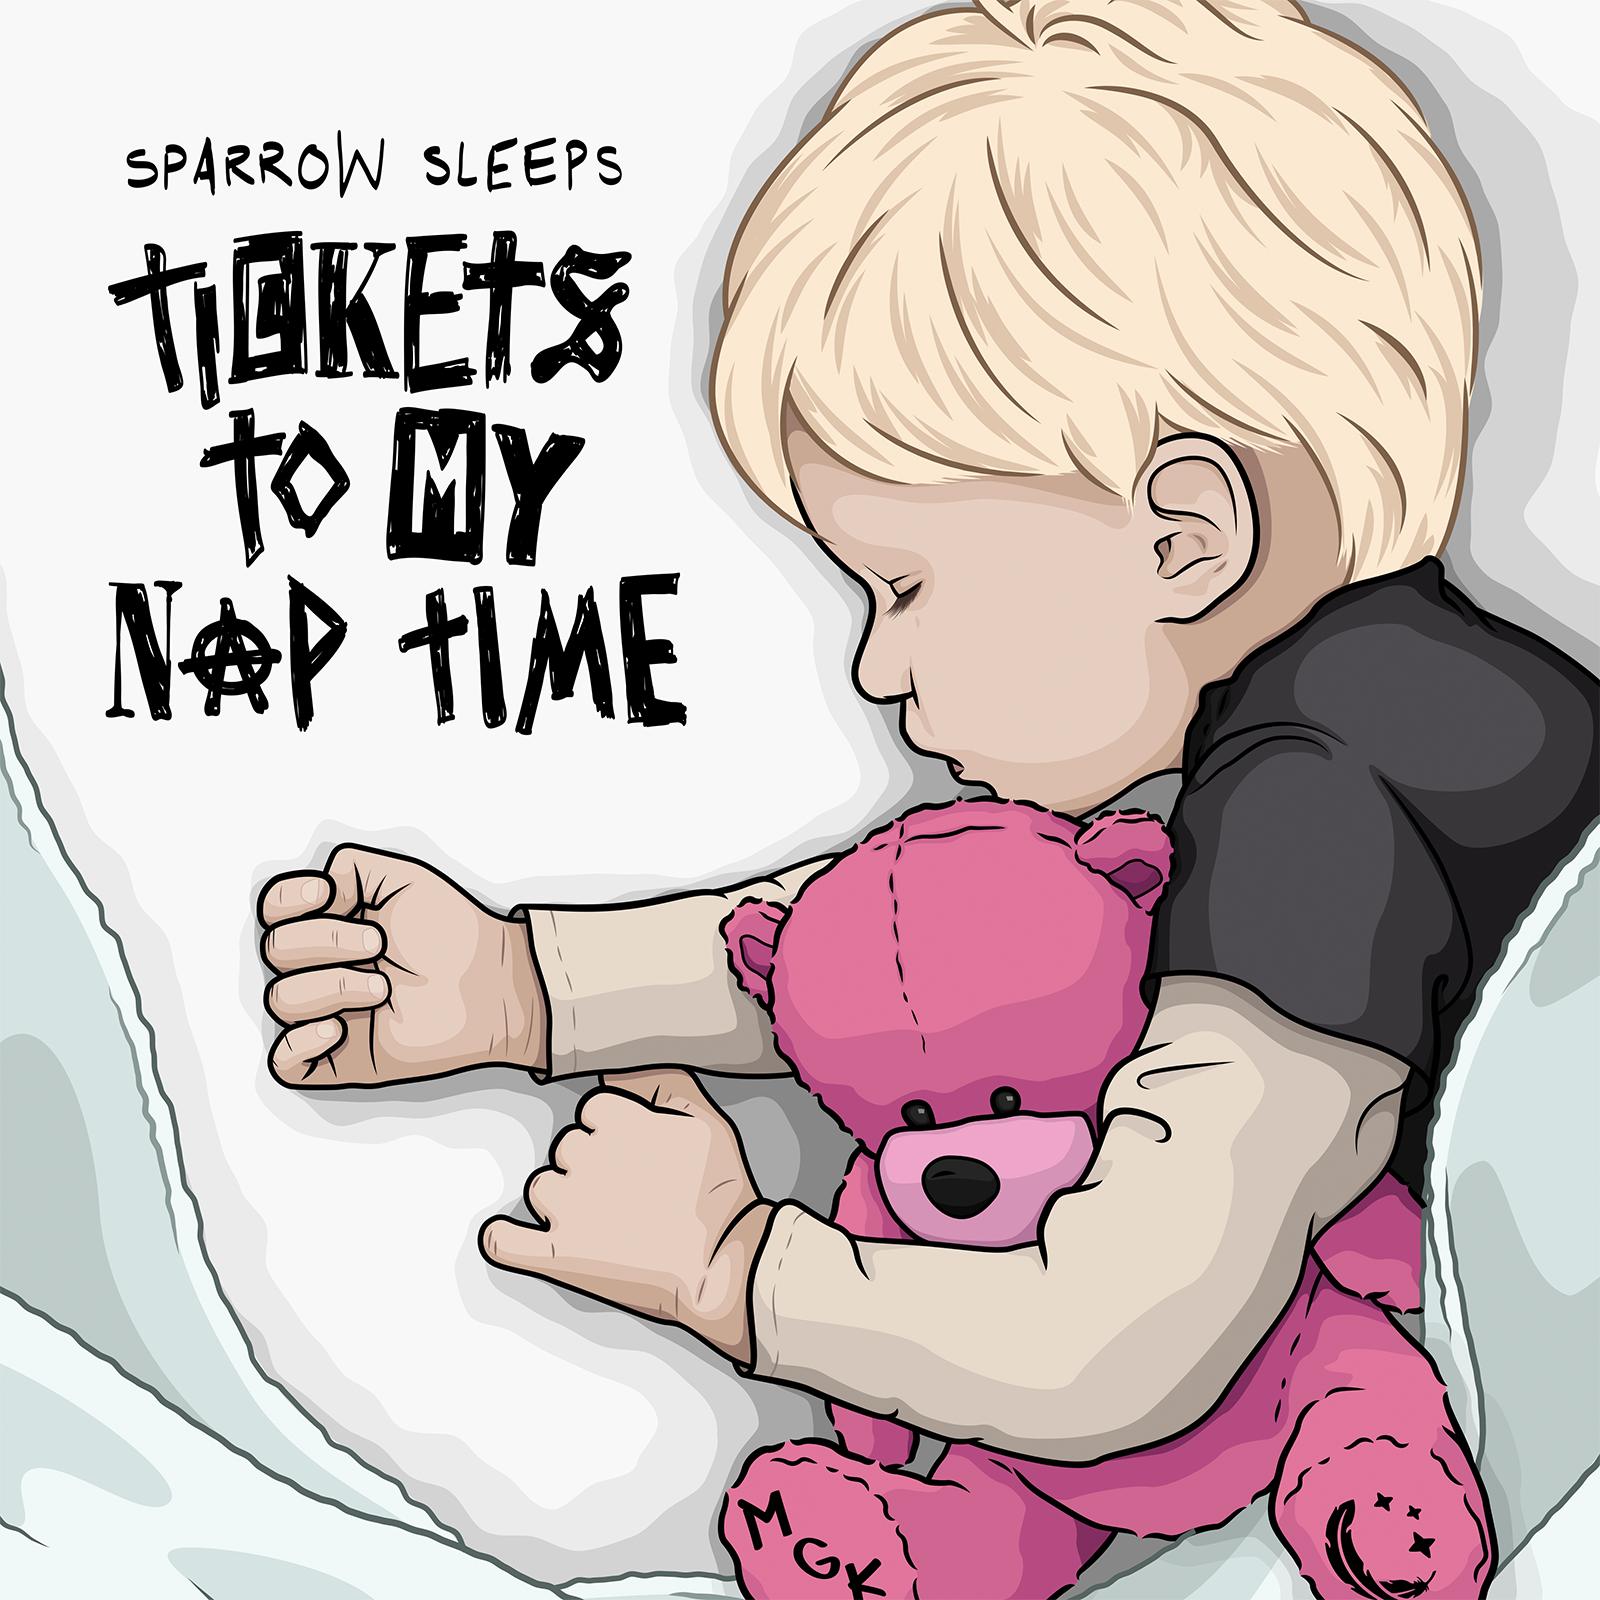 Machine Gun Kelly lullabies - Tickets to My Nap Time Image